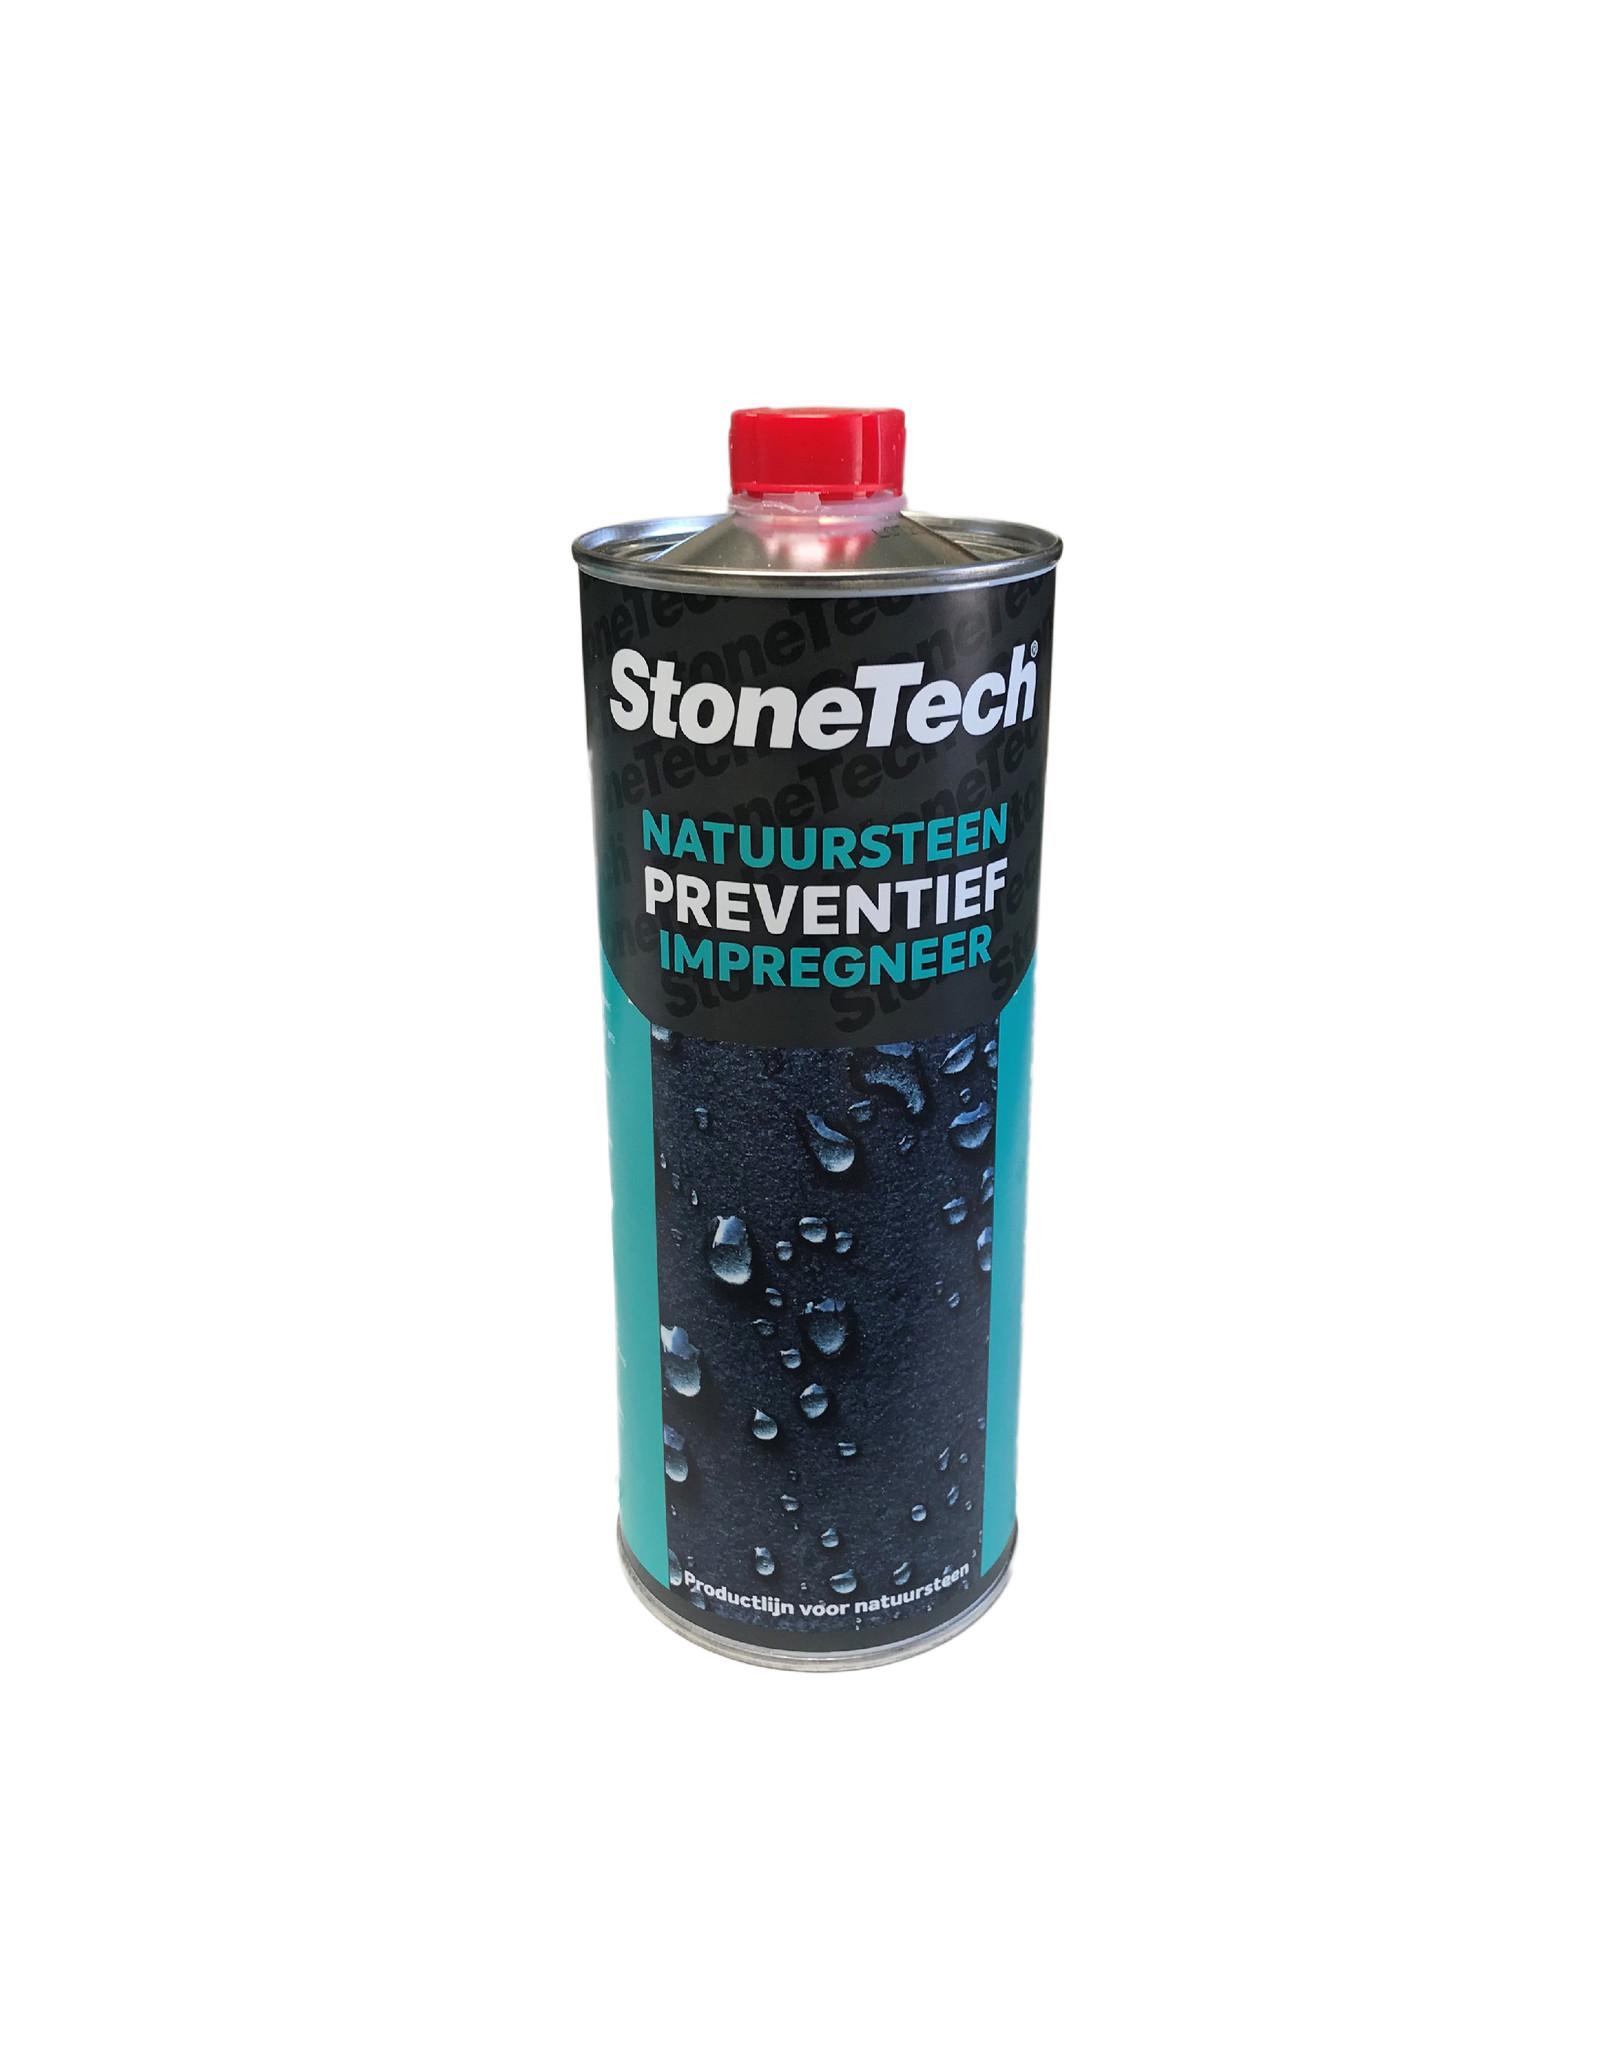 StoneTech Natuursteen Impregneer 1 Ltr